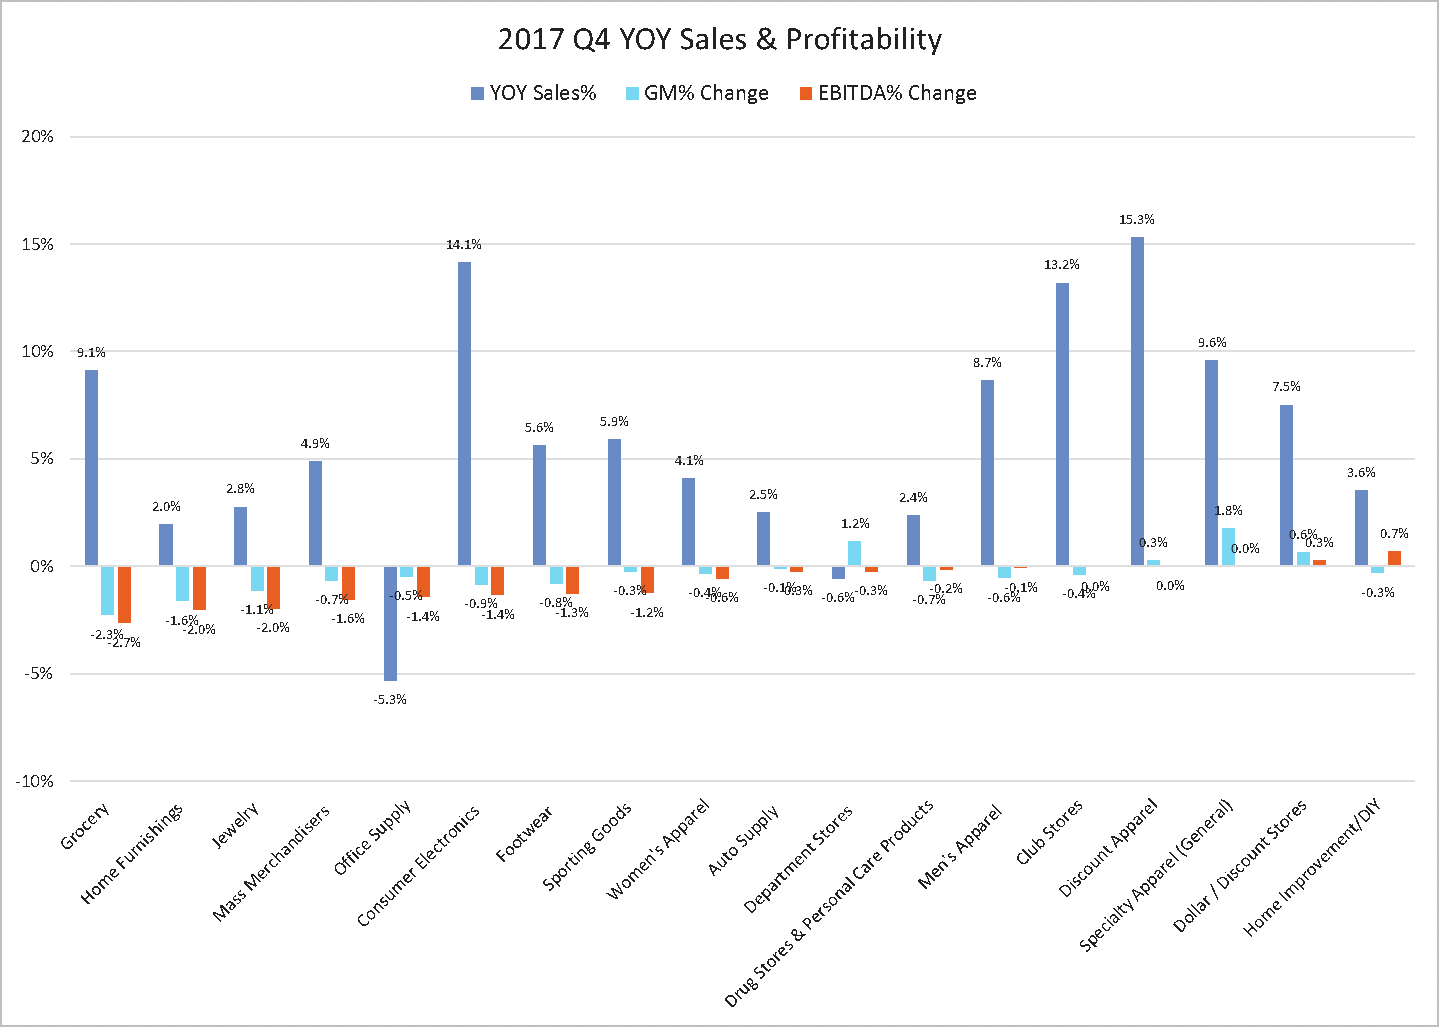 2017 Q4 YOY Sales And Profitability